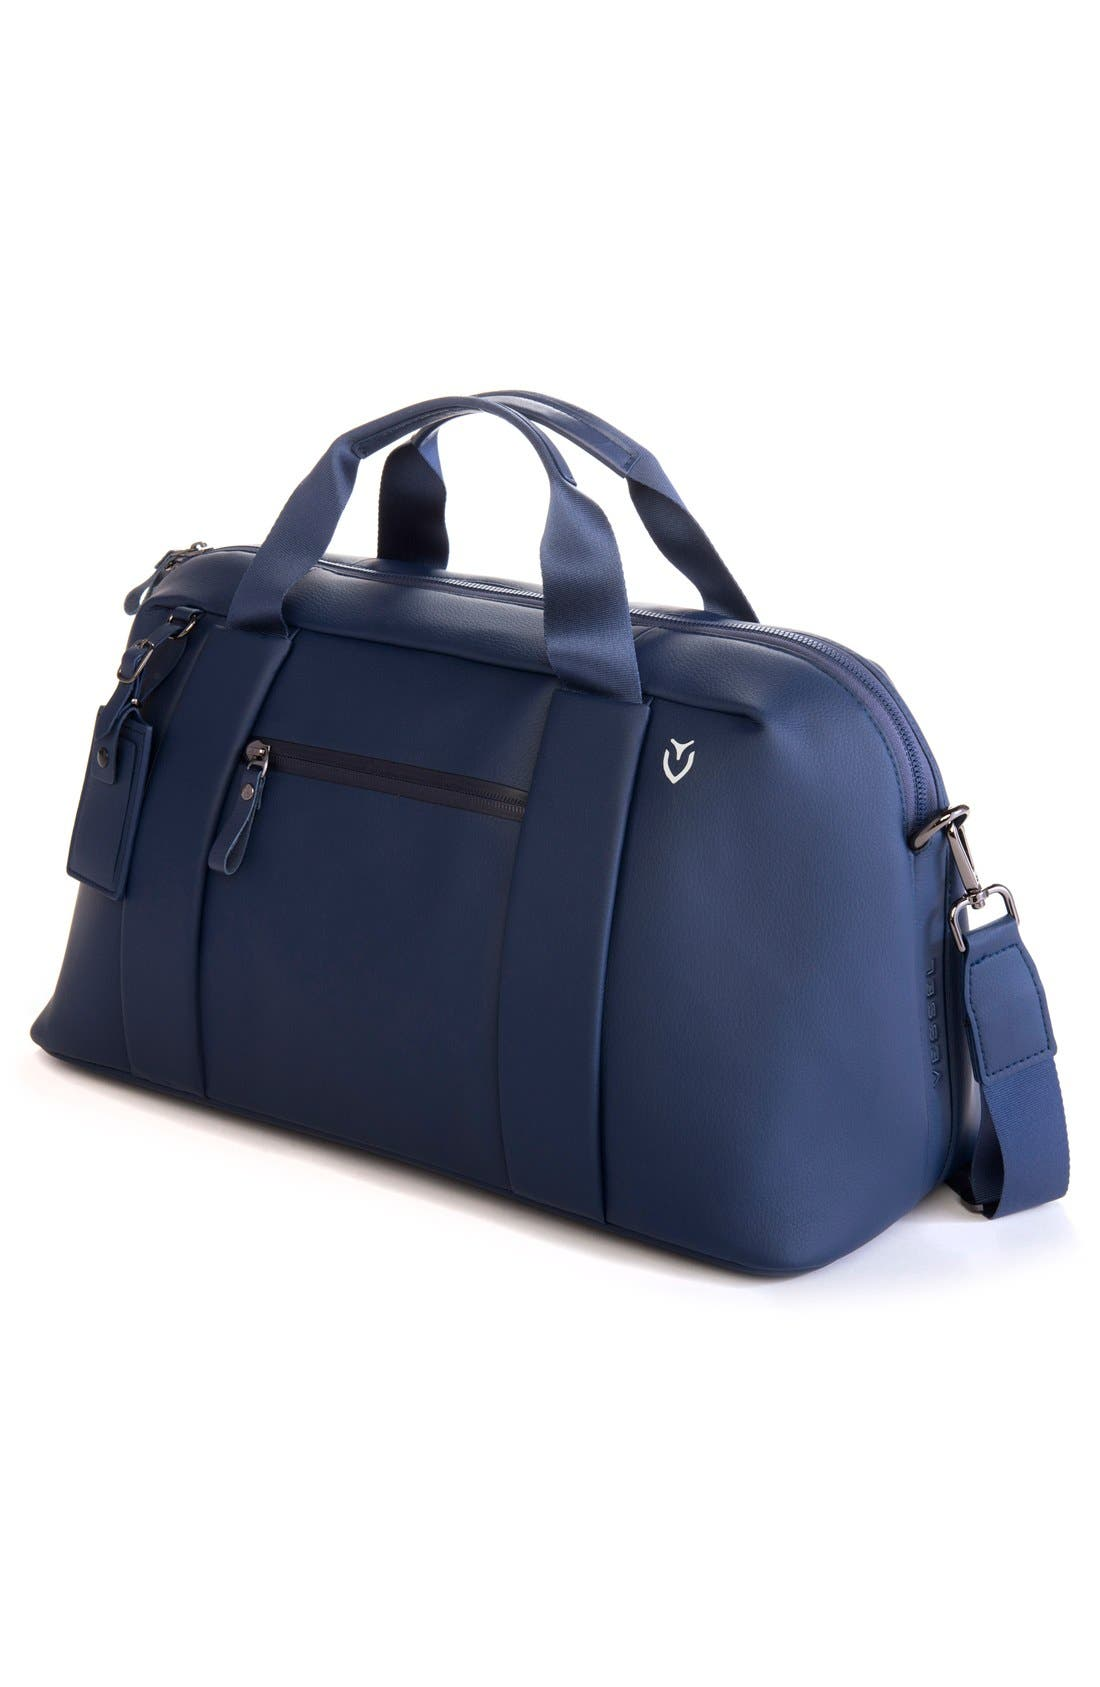 VESSEL,                             'Signature' Medium Duffel Bag,                             Alternate thumbnail 3, color,                             400